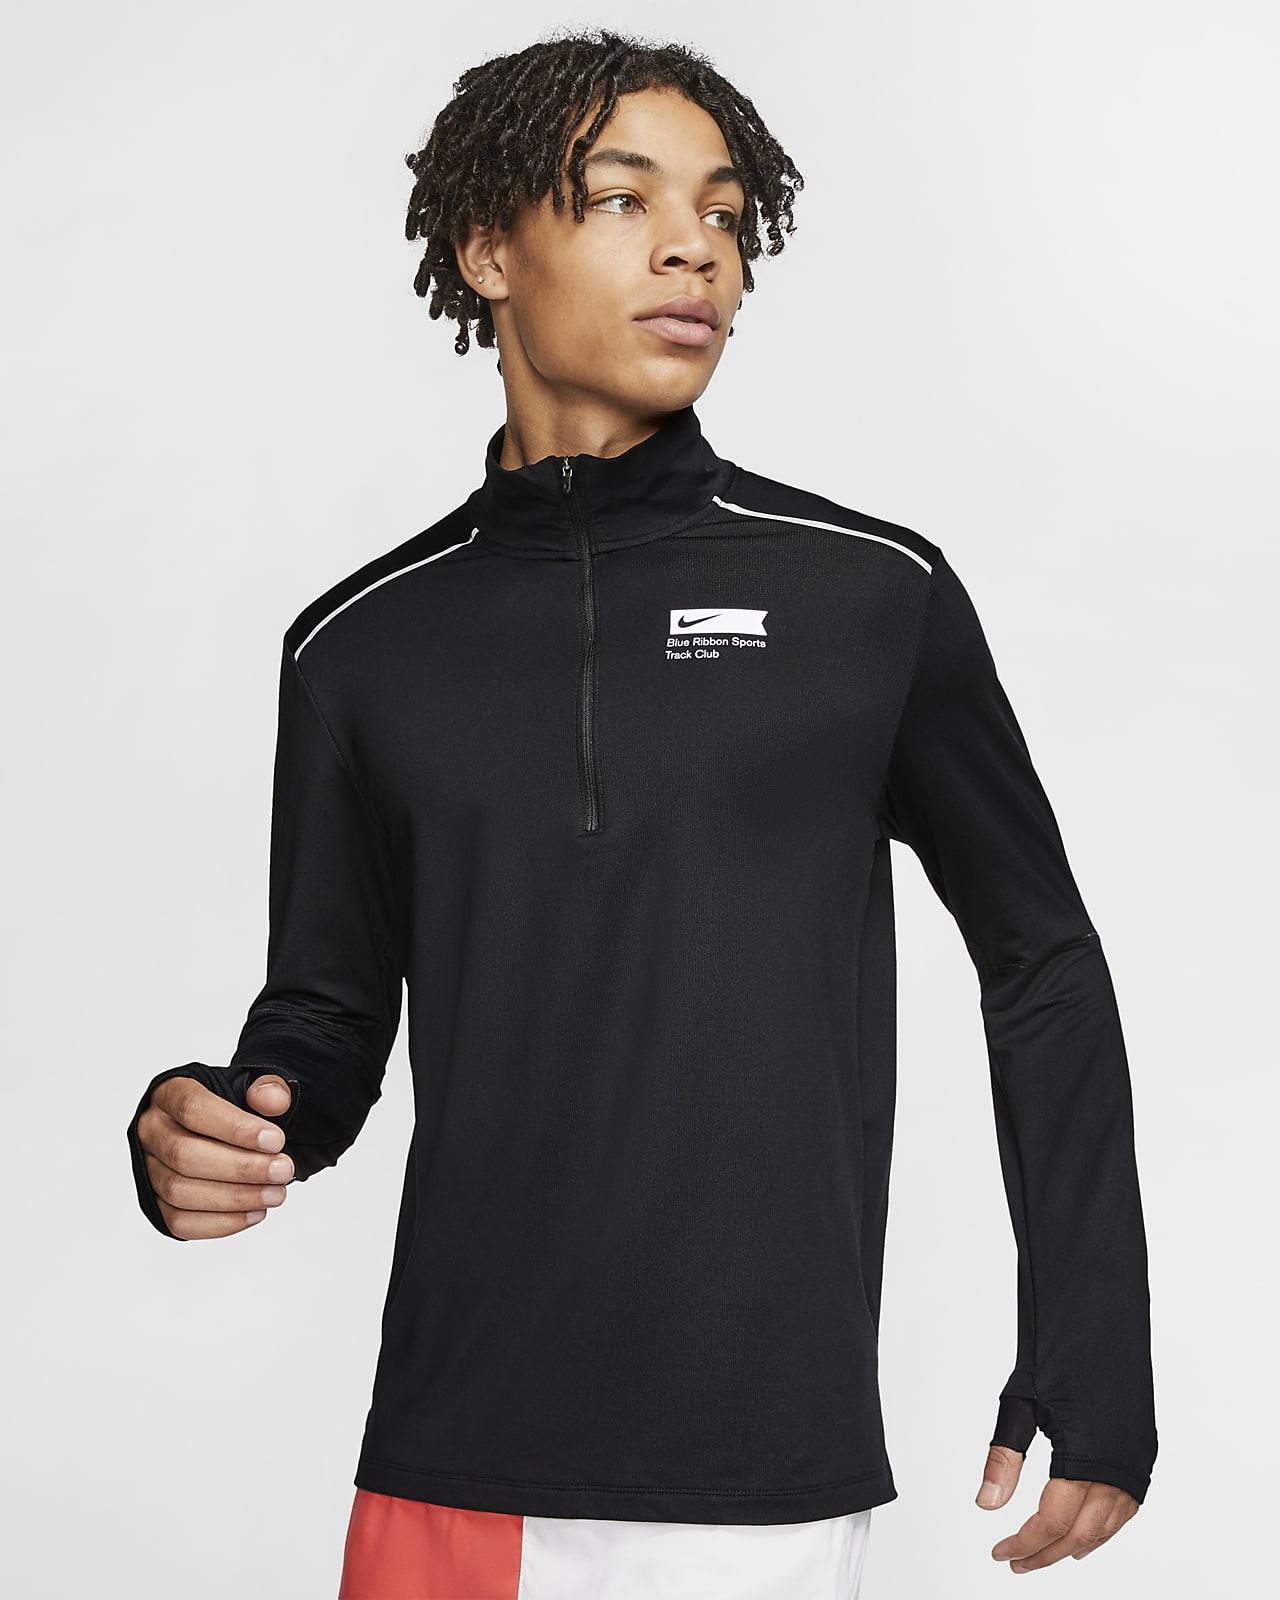 Nike Element Blue Ribbon Sports Men's 1/2-Zip Running Top